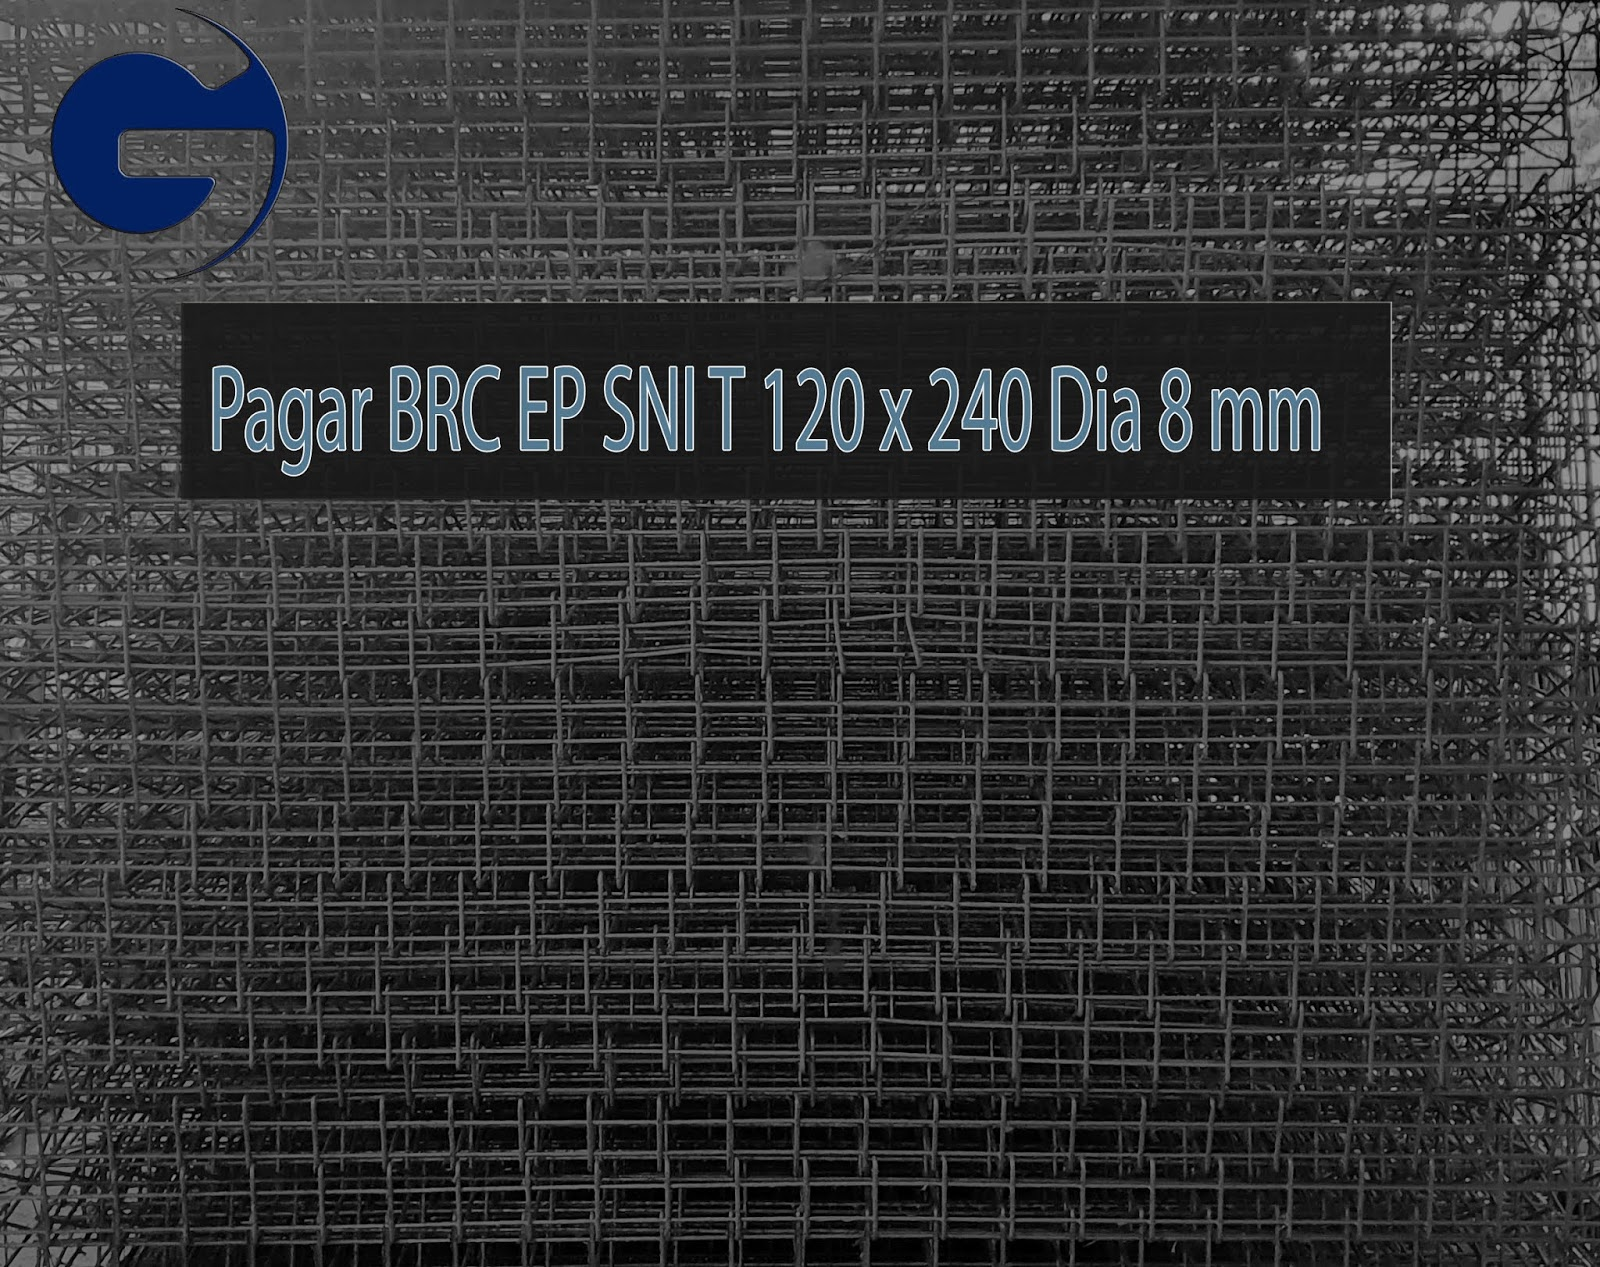 Jual Pagar BRC EP SNI T 120 x 240 Dia 8 mm